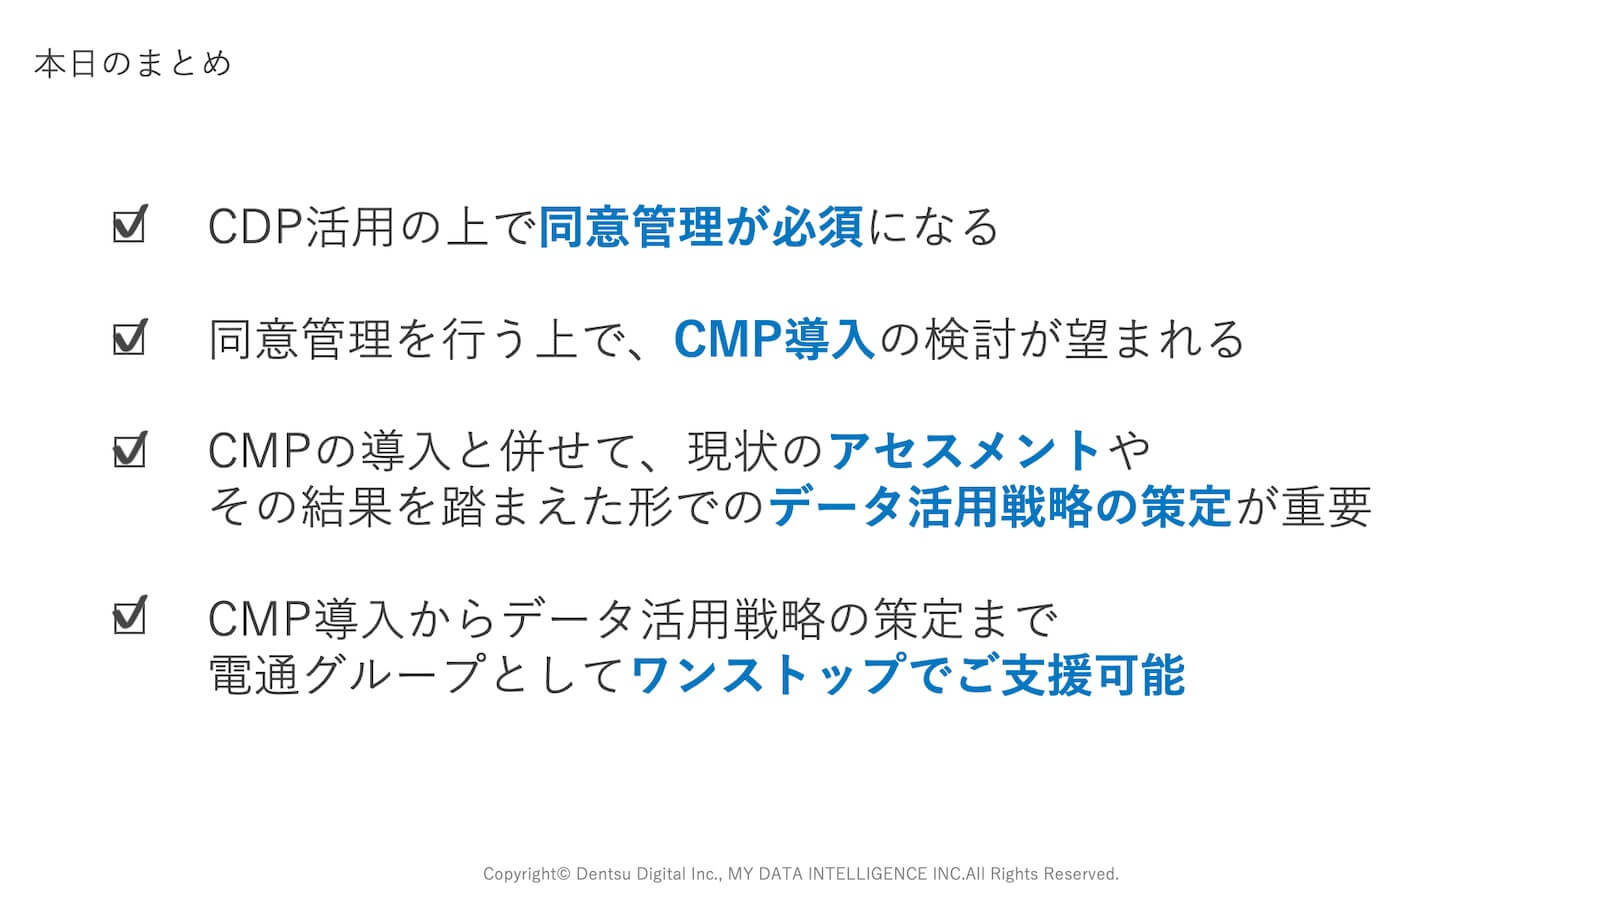 CDP活用の上で同意管理が必須になる